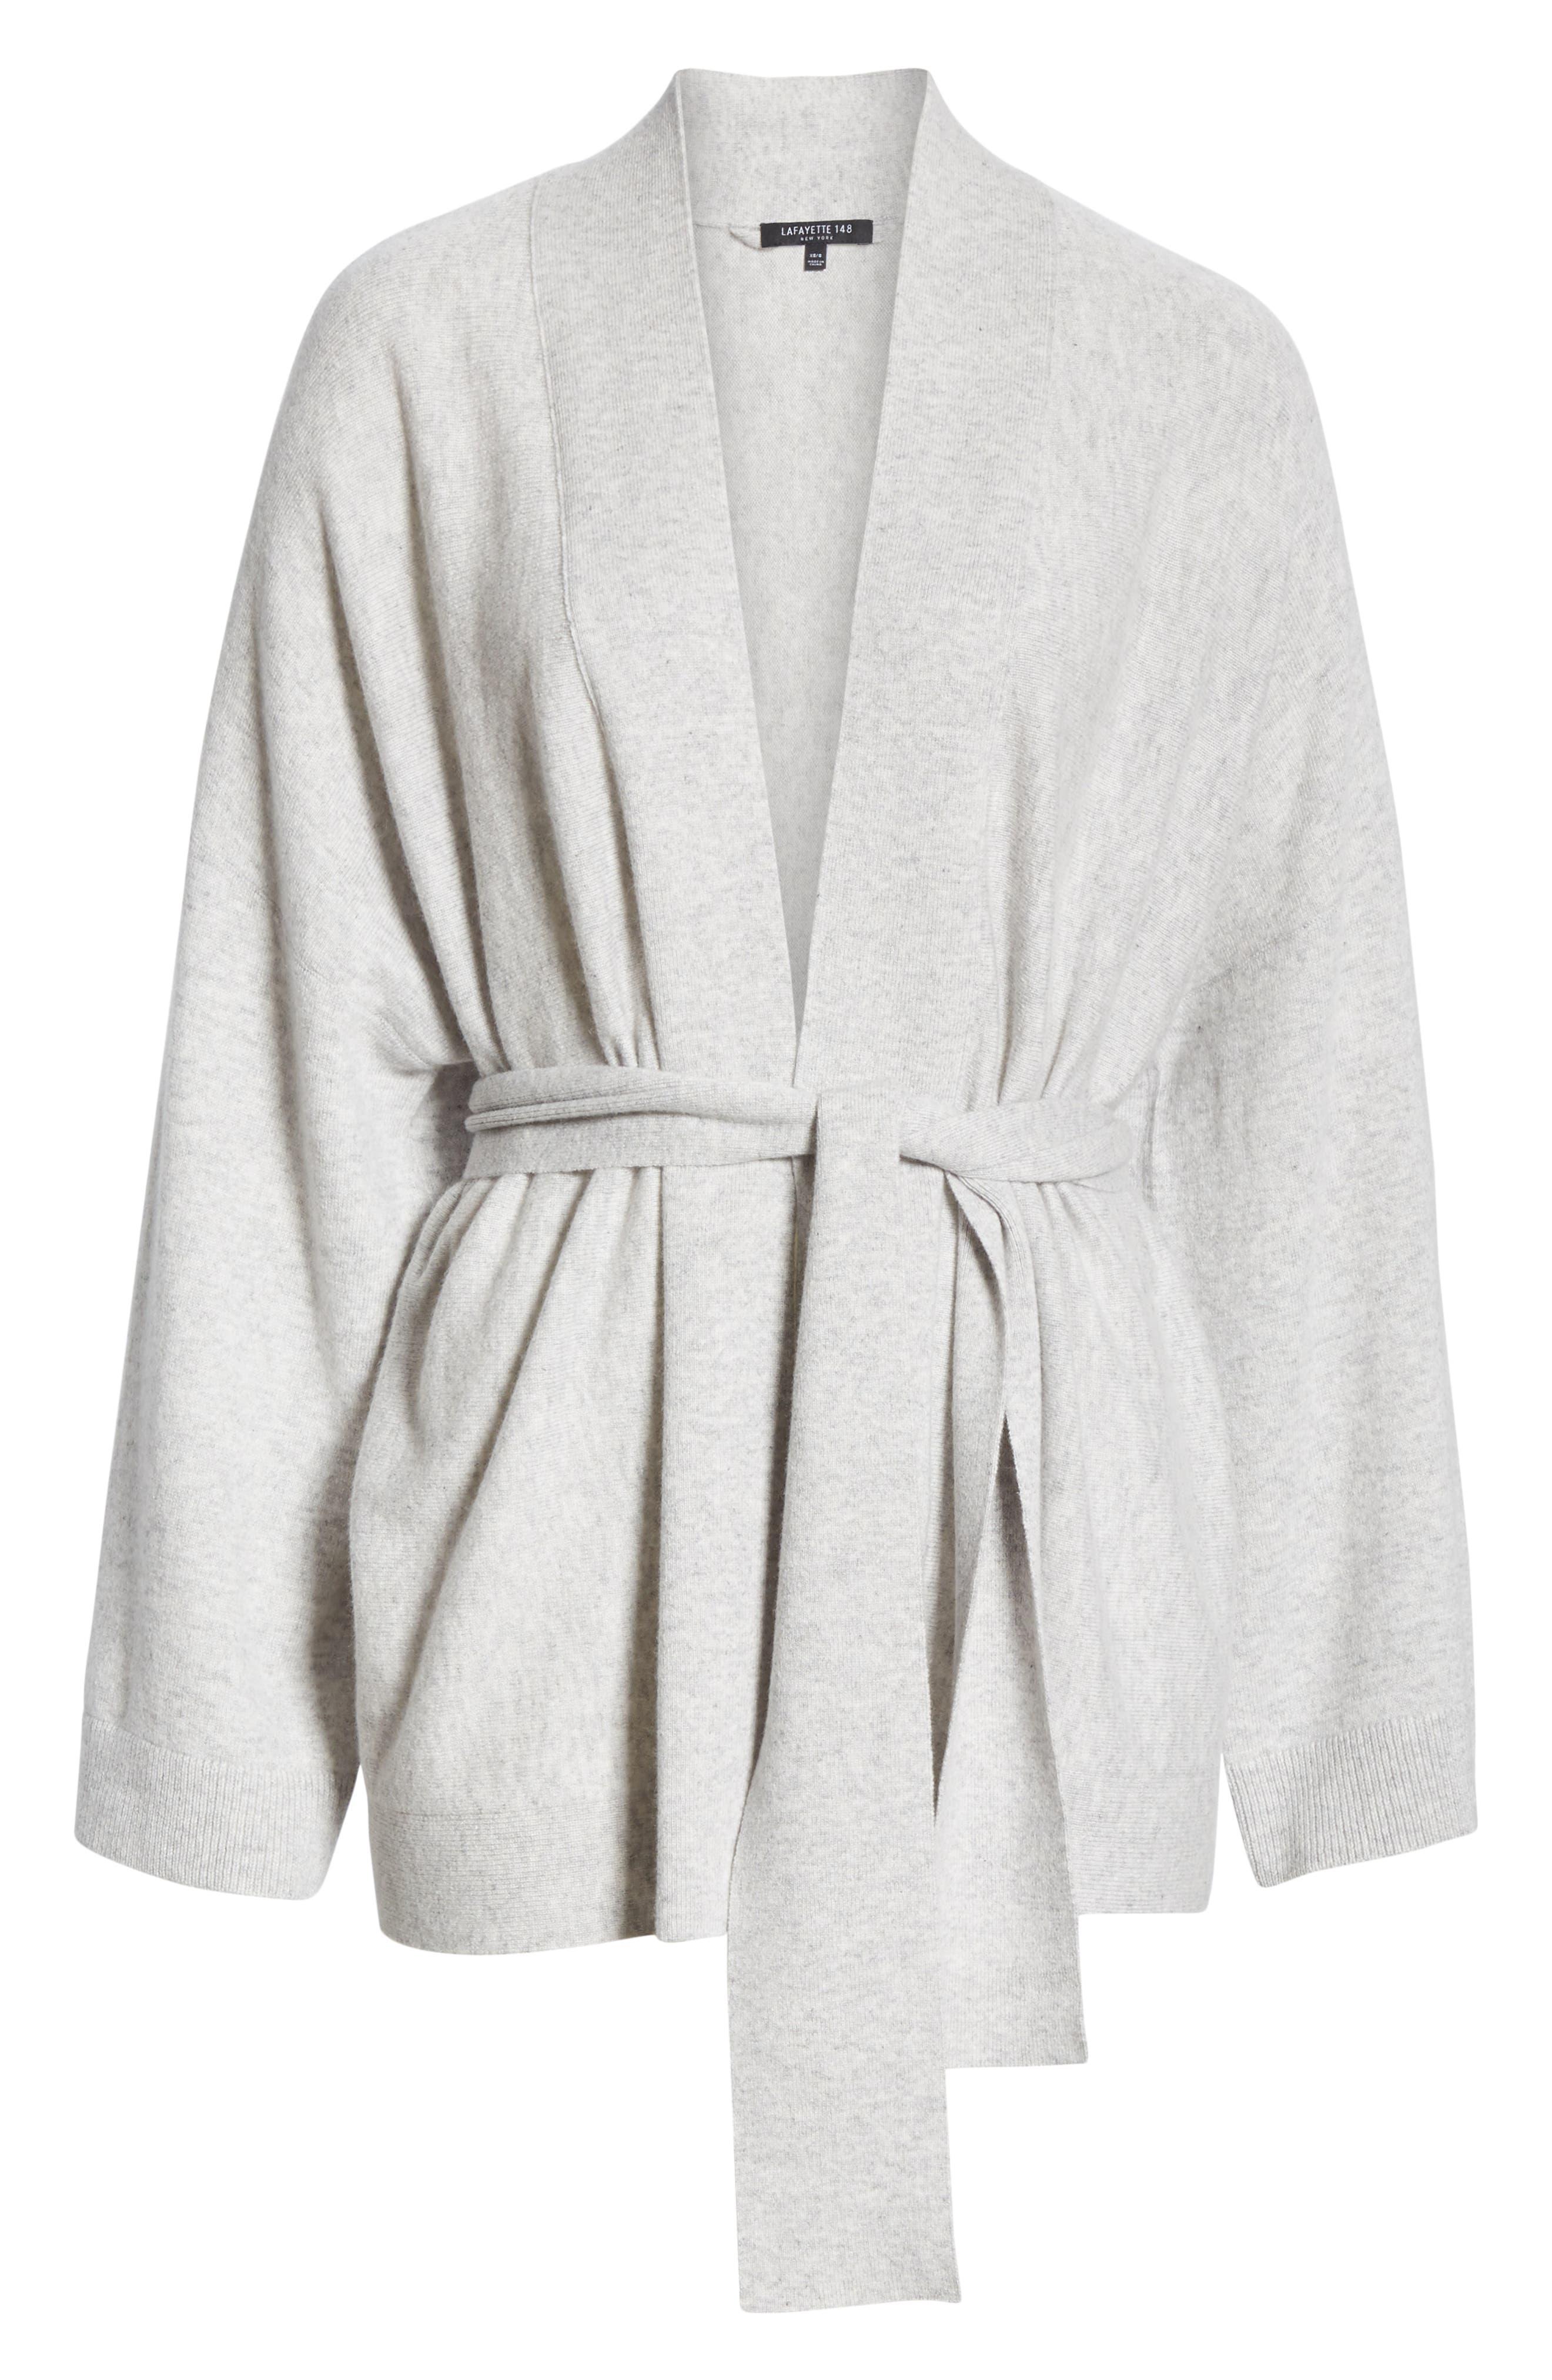 Cashmere Kimono Cardigan,                             Alternate thumbnail 7, color,                             GREY HEATHER